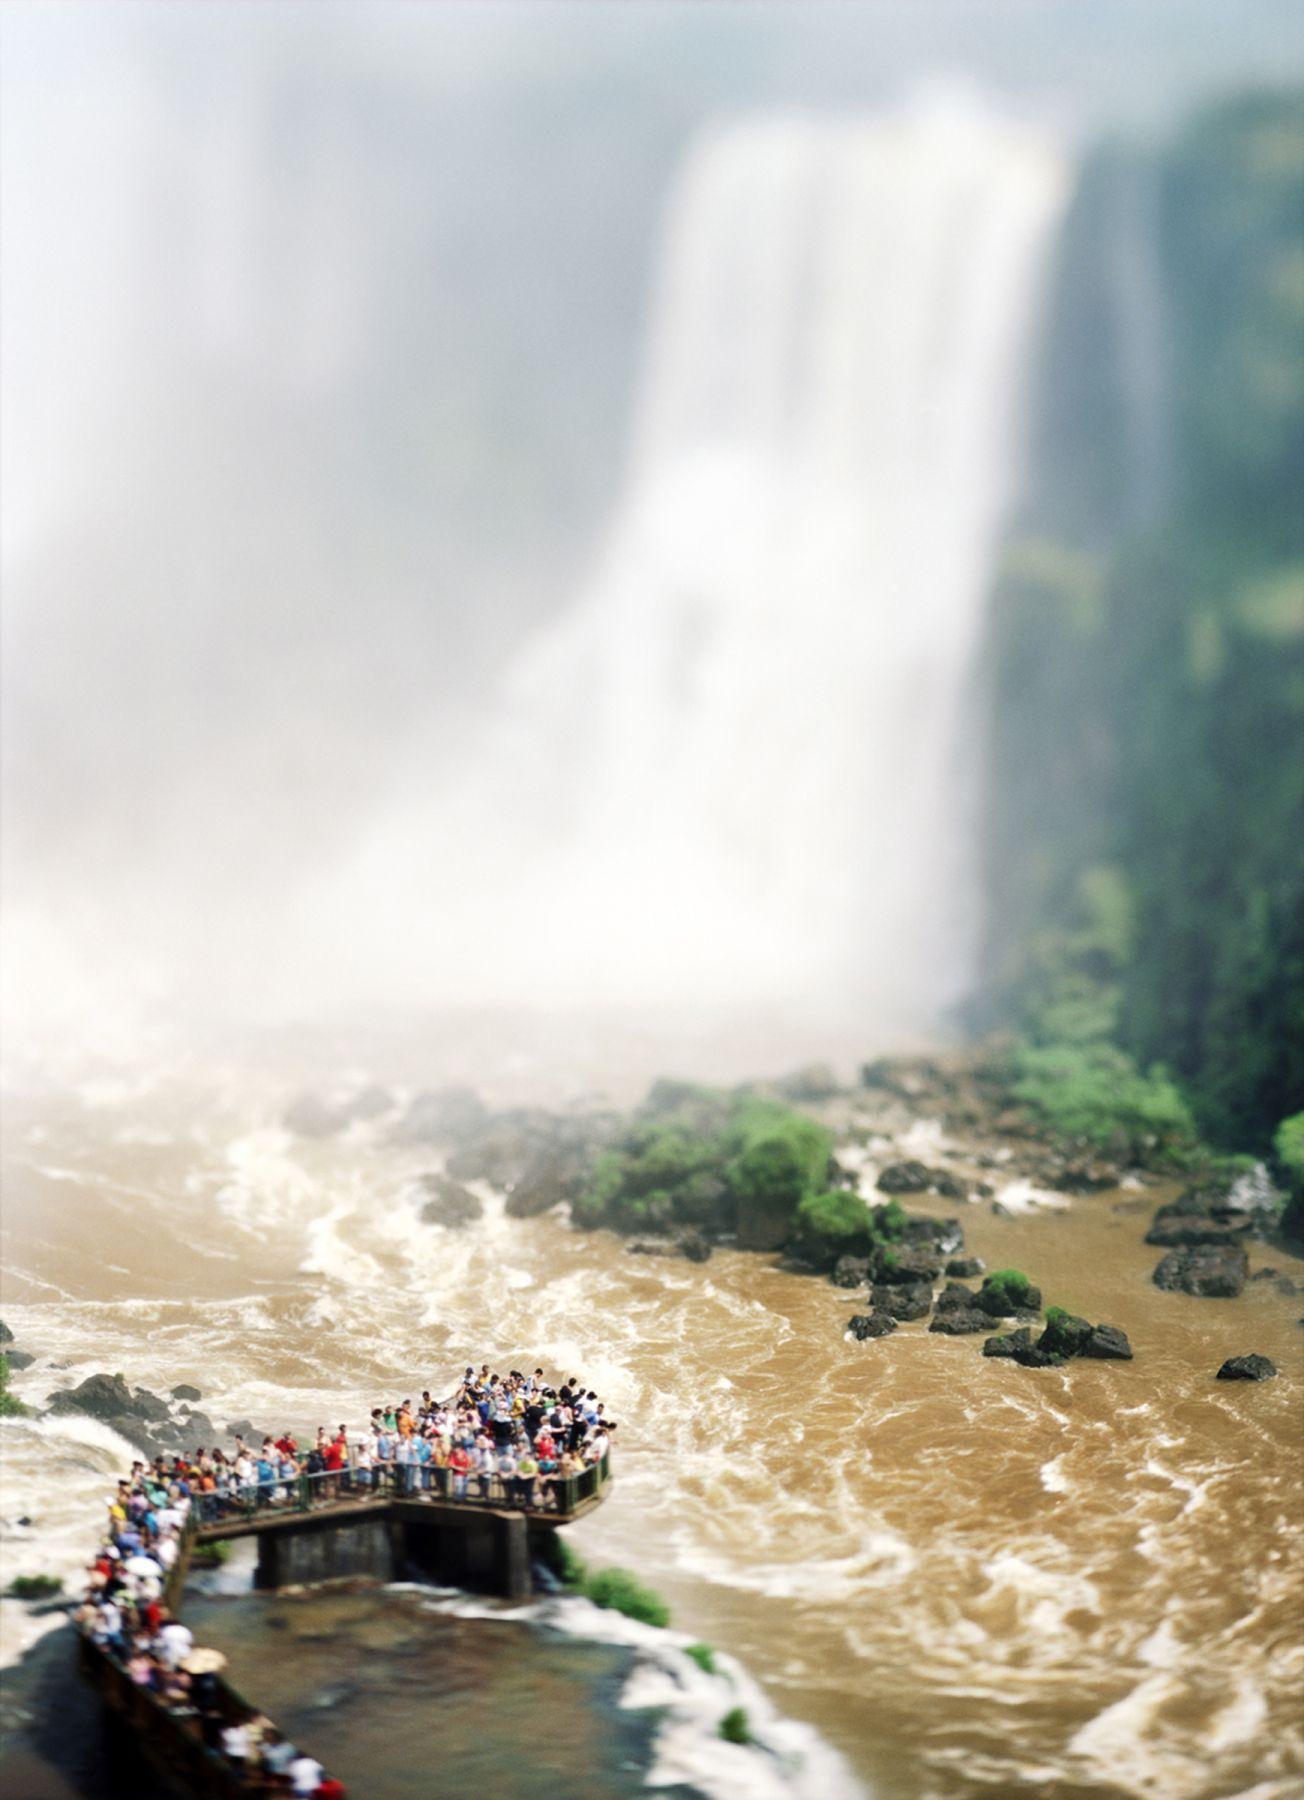 The Waterfalls Project (Iguazu), 2007, 61 x 45 inch or 85 x 65 inch archival pigment print,